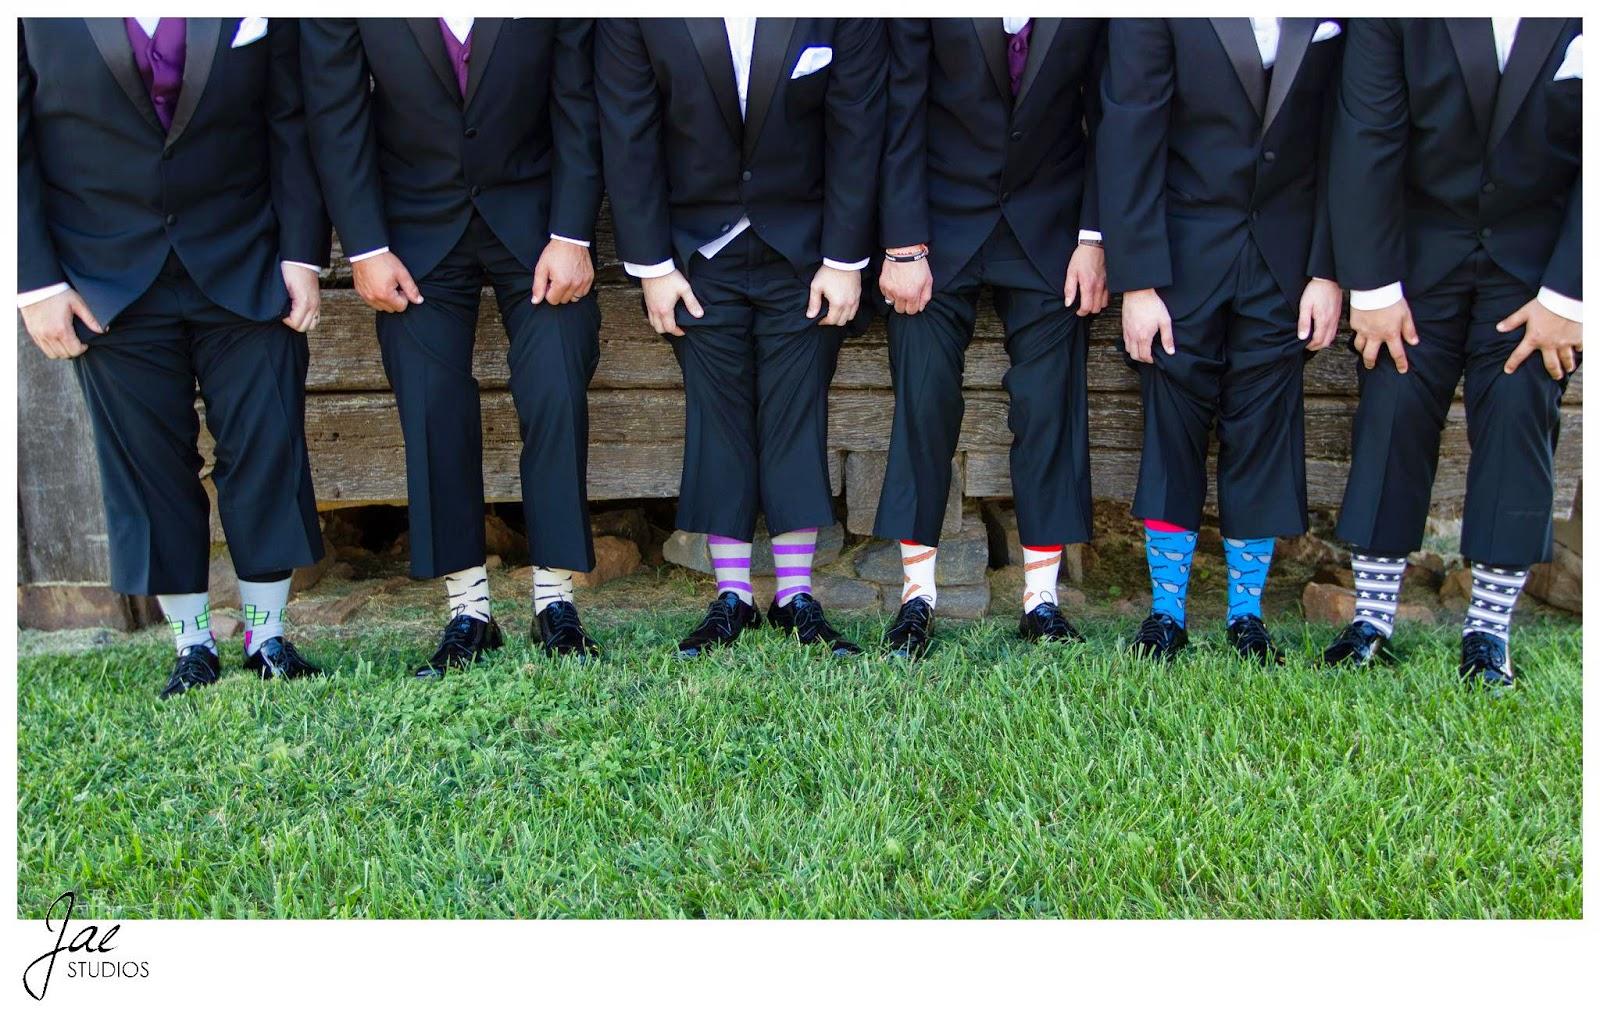 Jonathan and Julie, Bird cage, West Manor Estate, Wedding, Lynchburg, Virginia, Jae Studios, groomsmen, best man, groom, grass, socks, colorful, stripes, patterned, green, gray, purple, yellow, blue, red, tuxedo